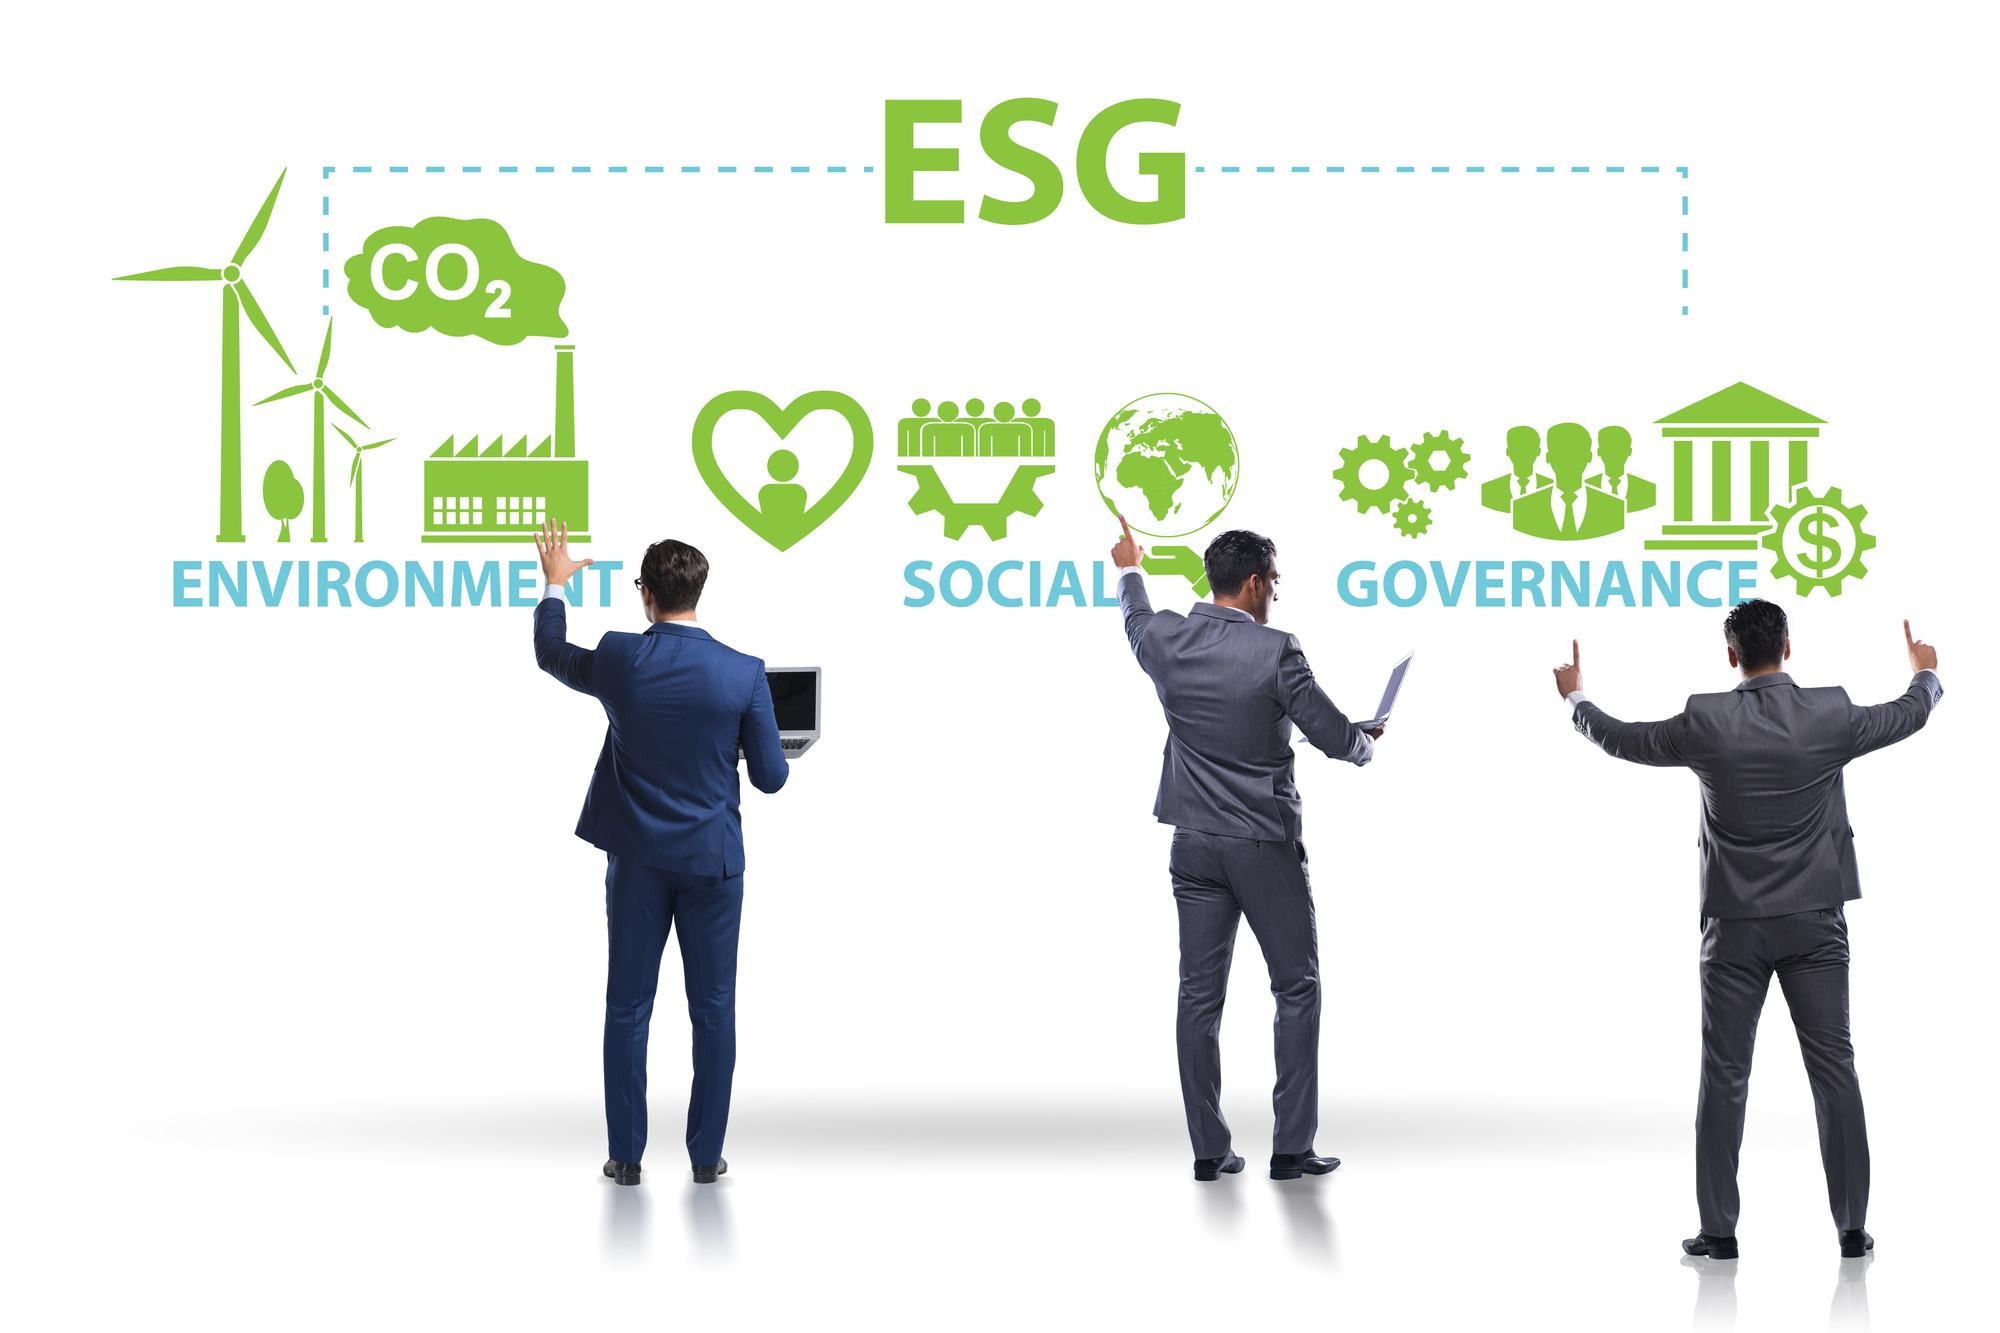 Survey of Japanese Asset Managers on ESG/Sustainability Investment